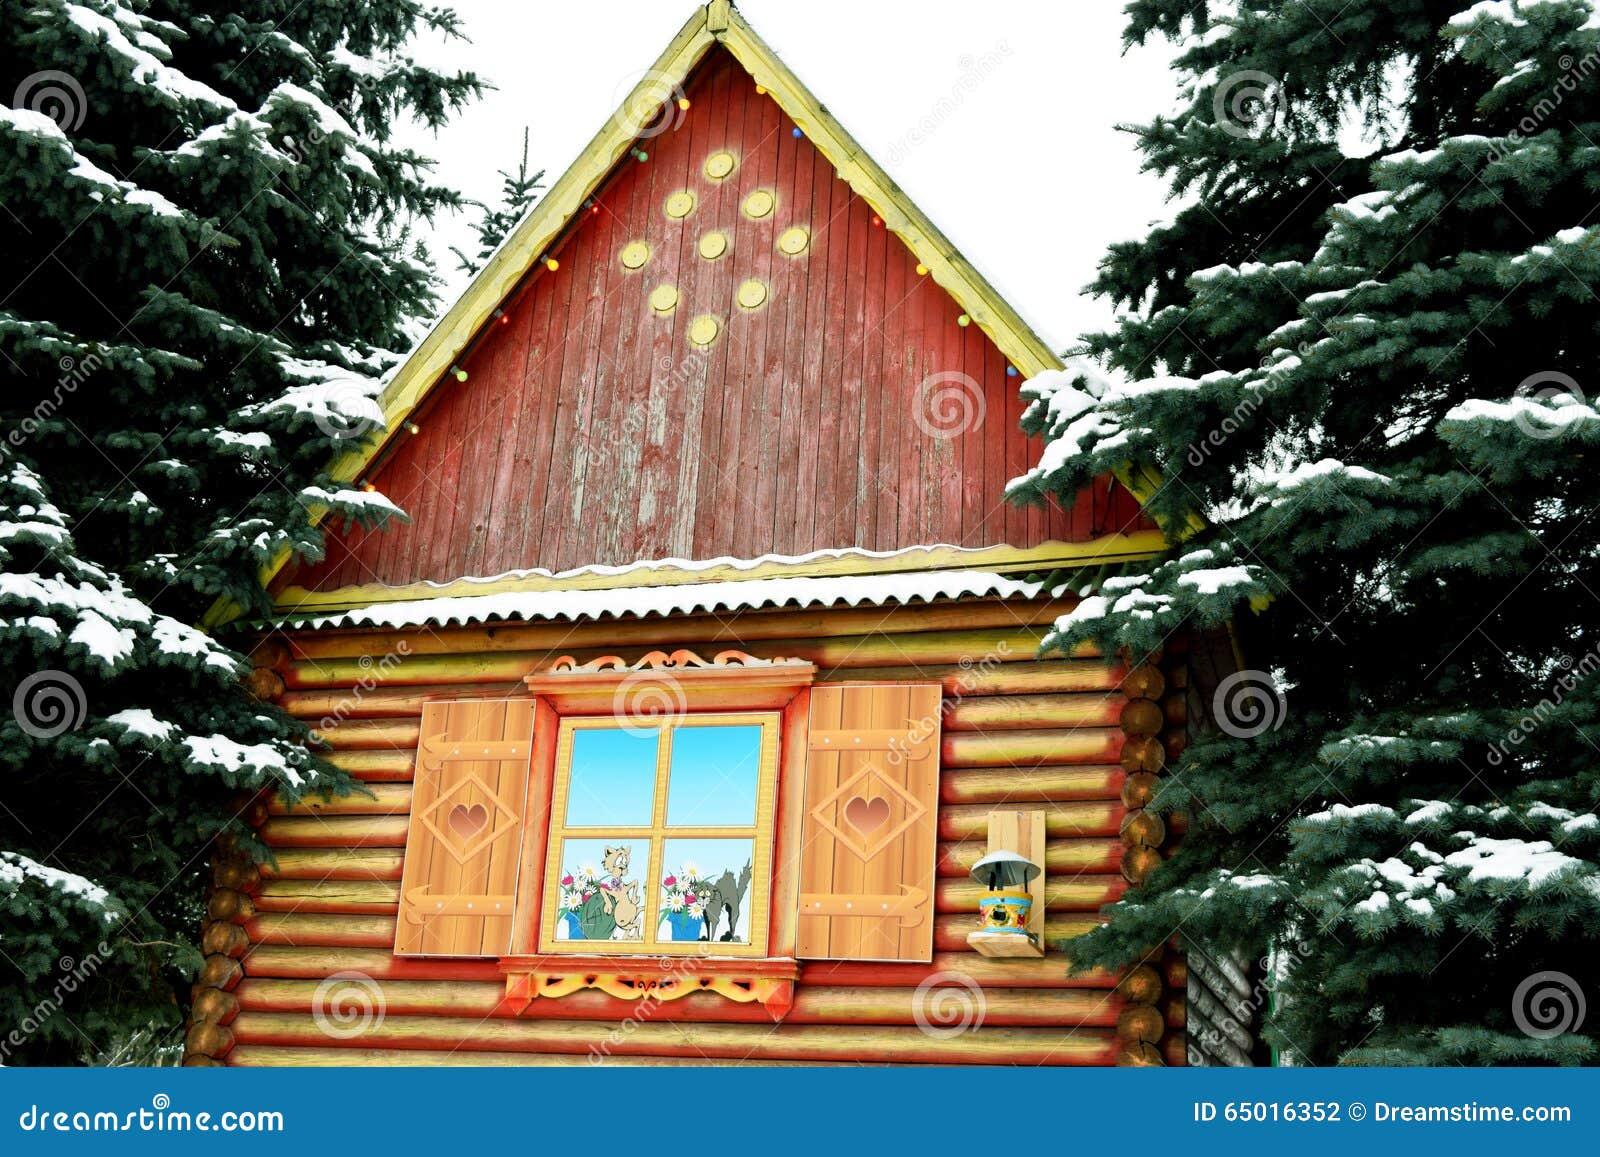 Winter Hut Stock Photo Image Of Holiday Santa Claus